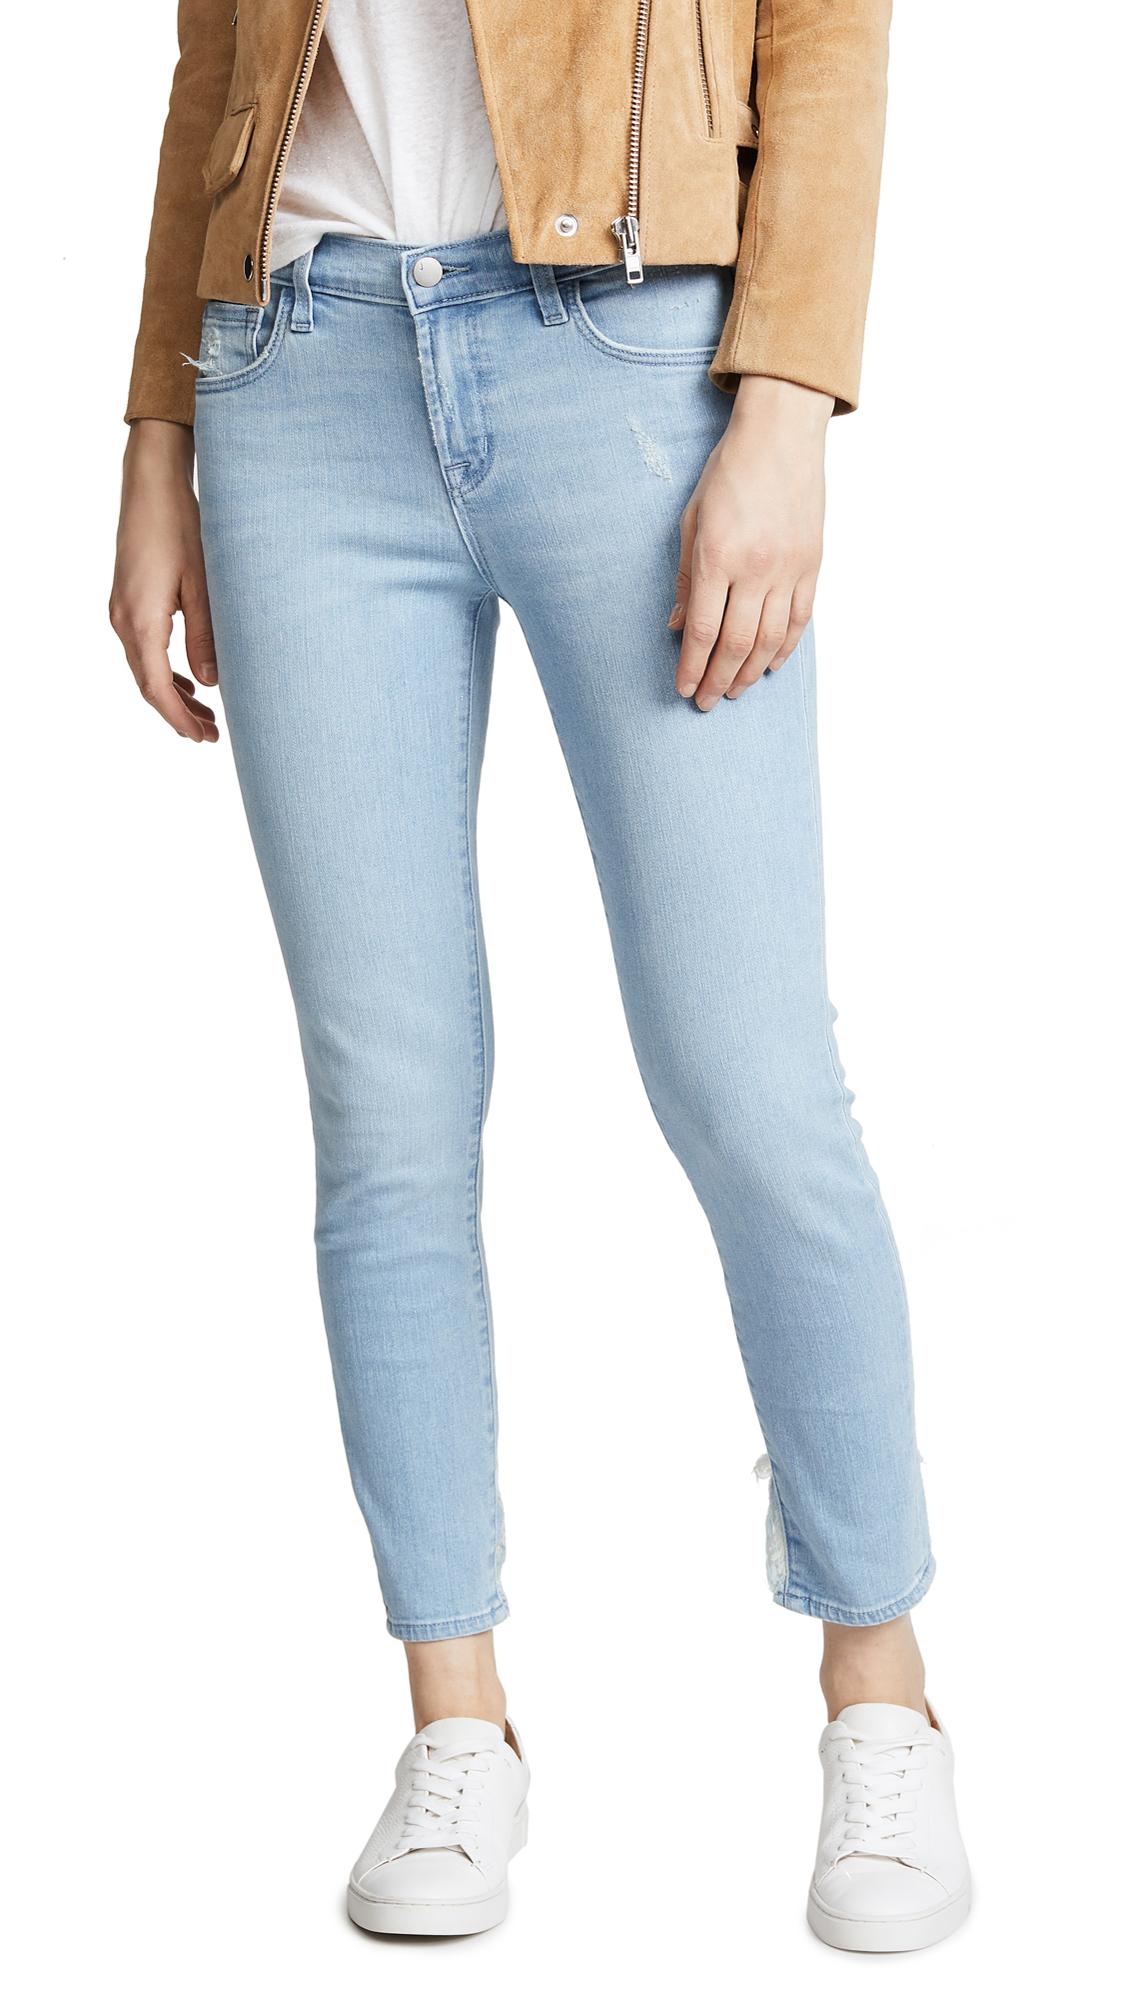 J Brand 835 Mid Rise Capri Jeans In Sky Destruct